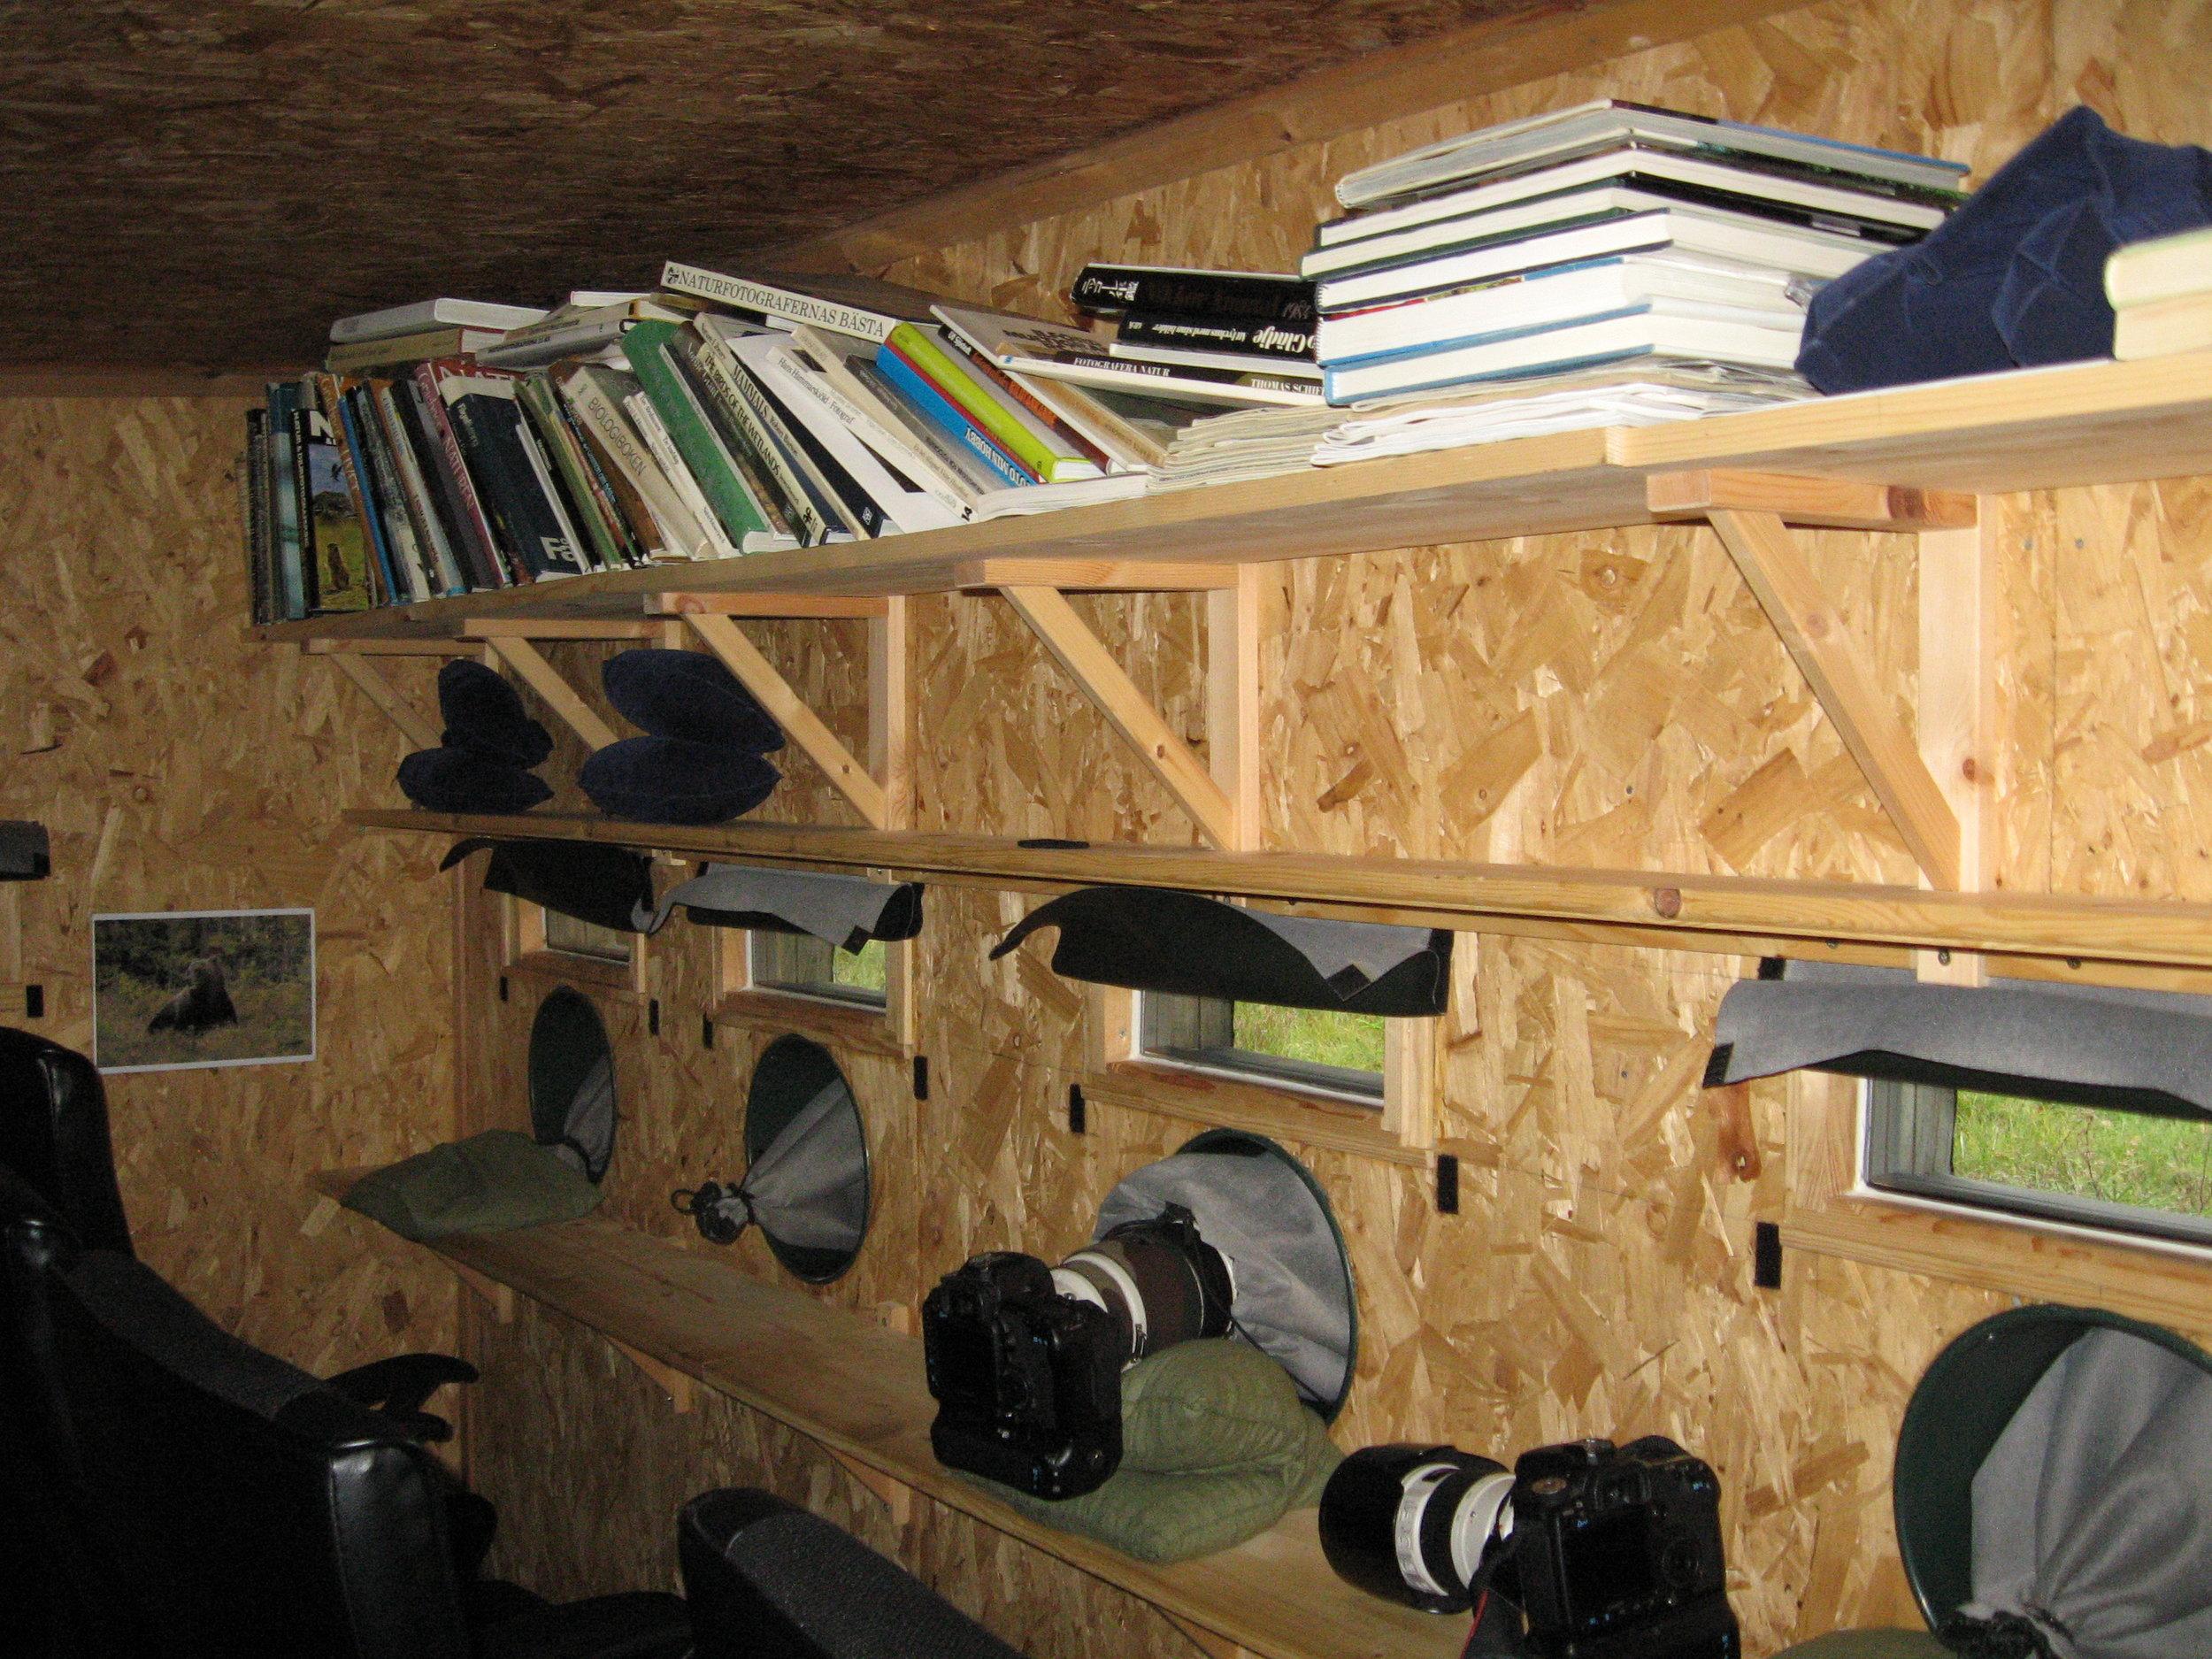 Photo cabin interior. Photo: Håkan Vargas